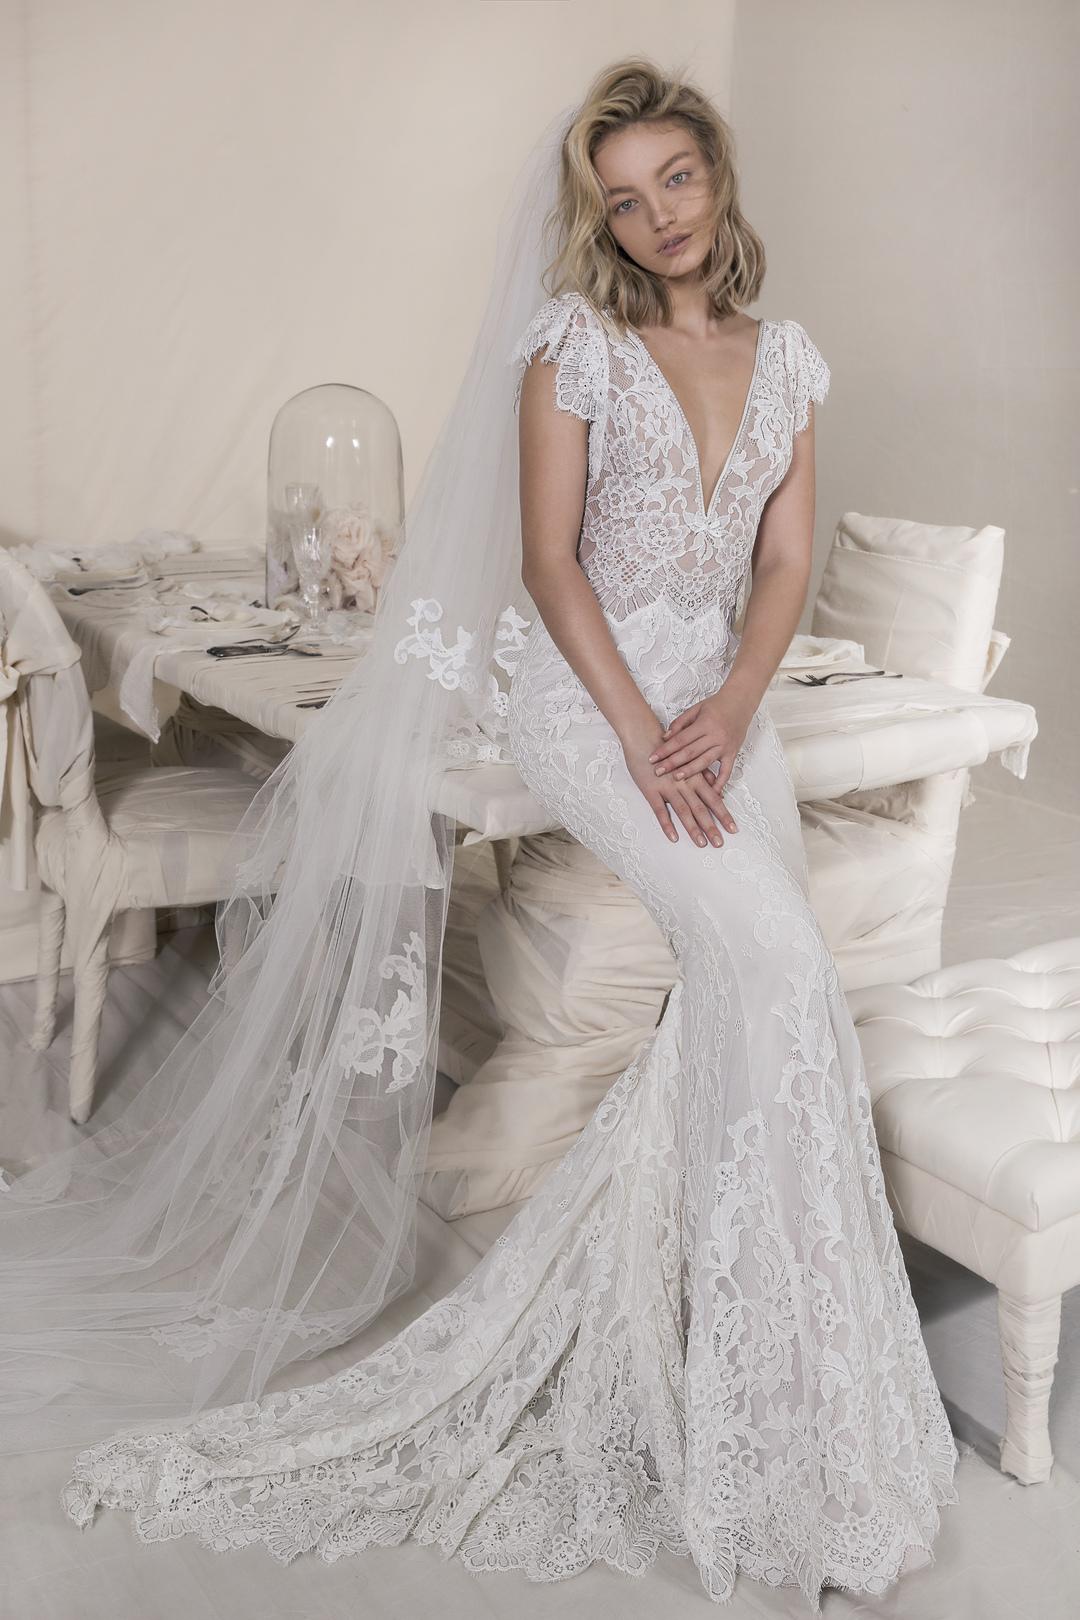 Dress main 2x 1546868240